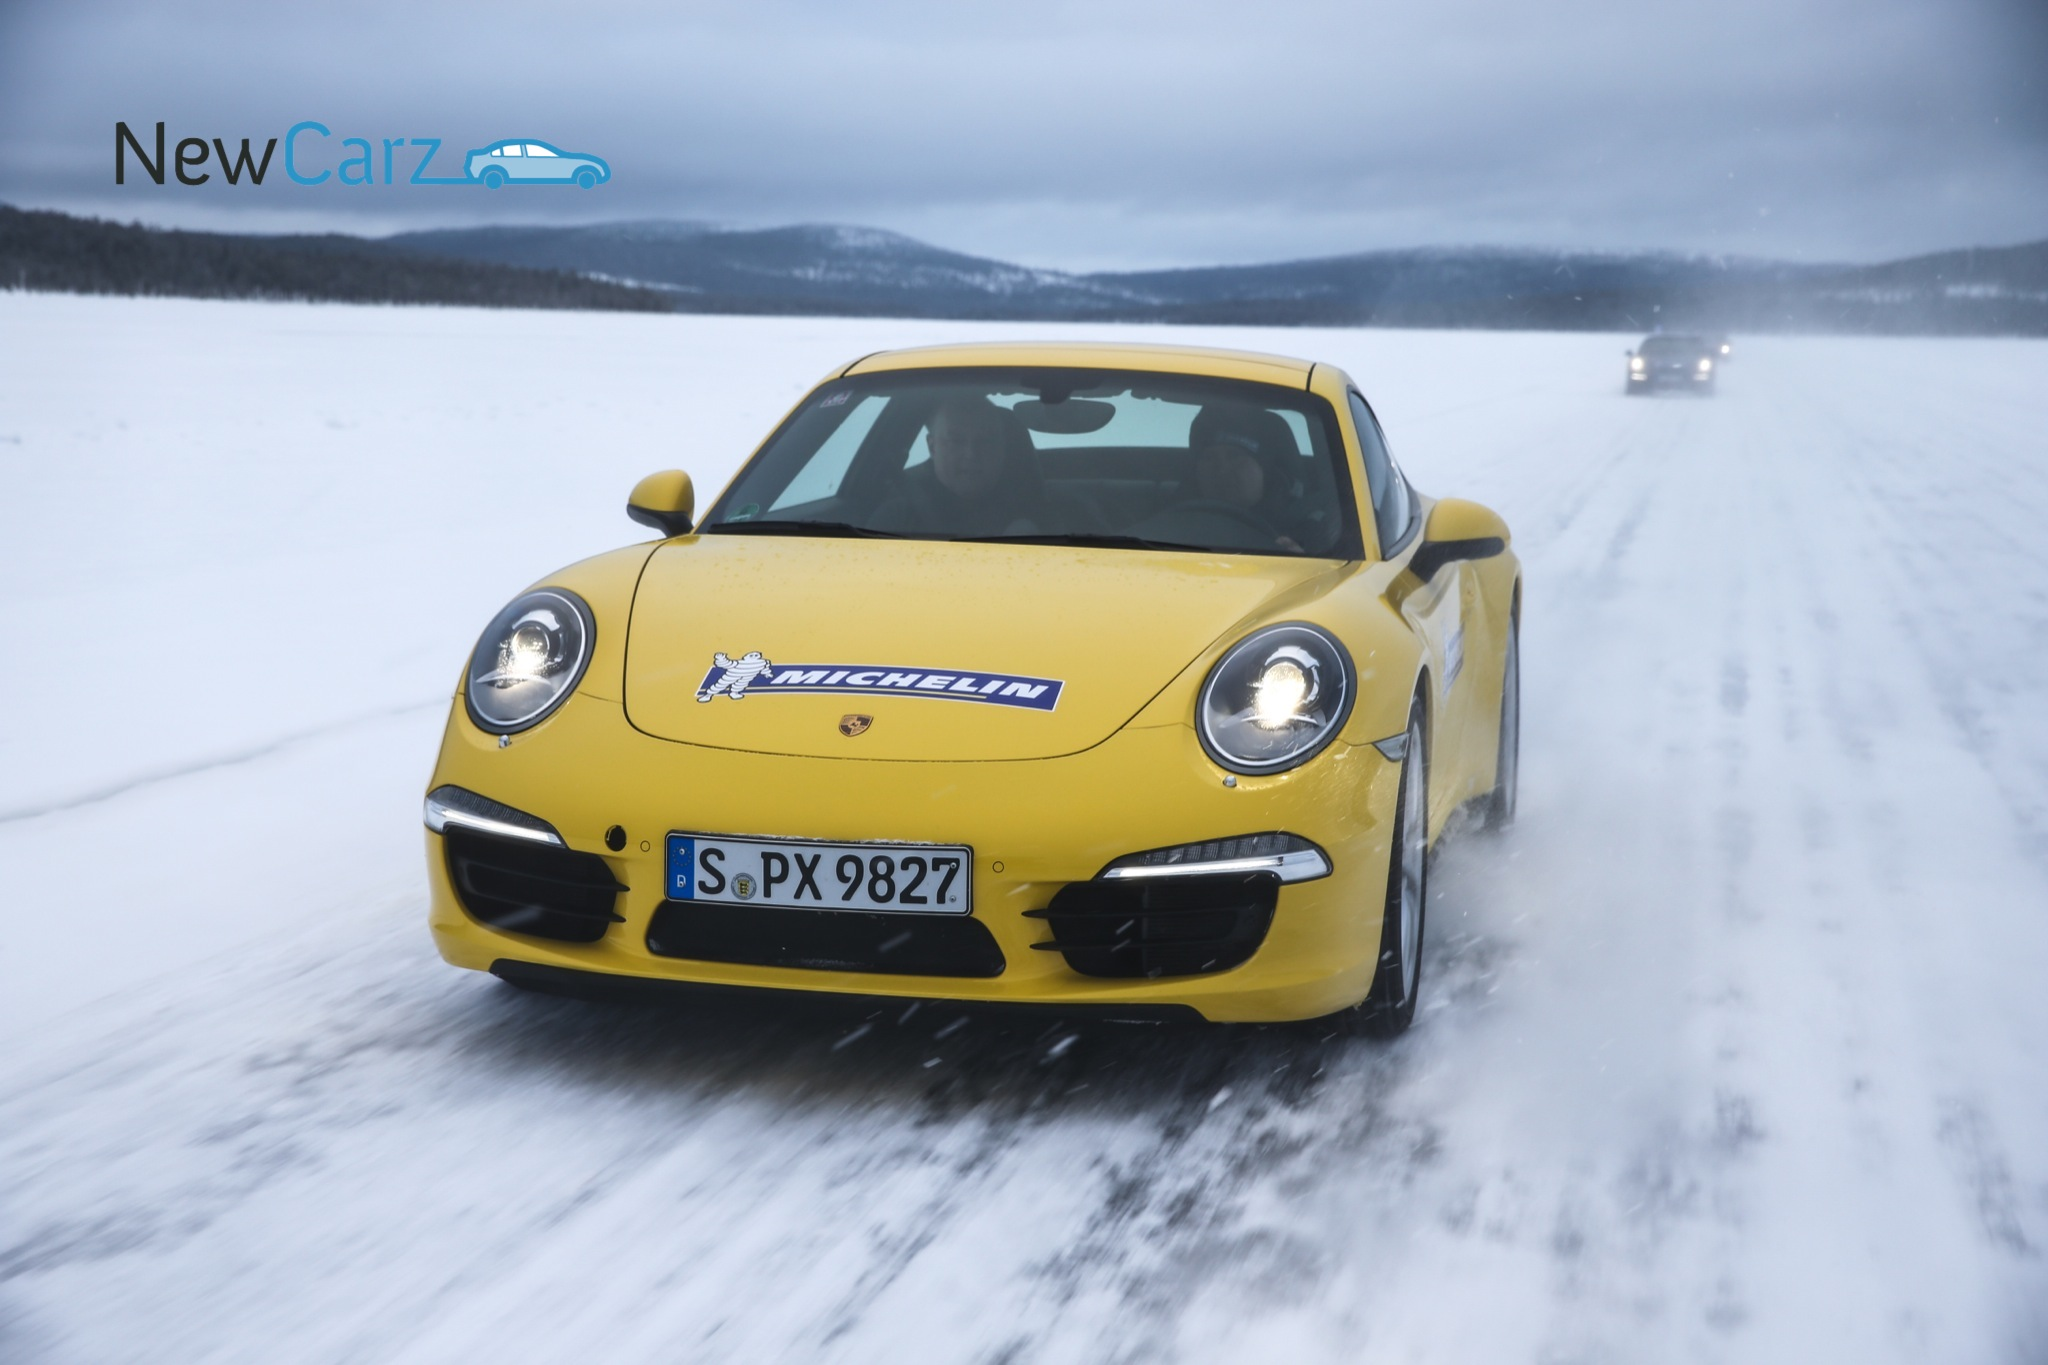 NewCarz-Michelin-Finnland-Polarkreis-577